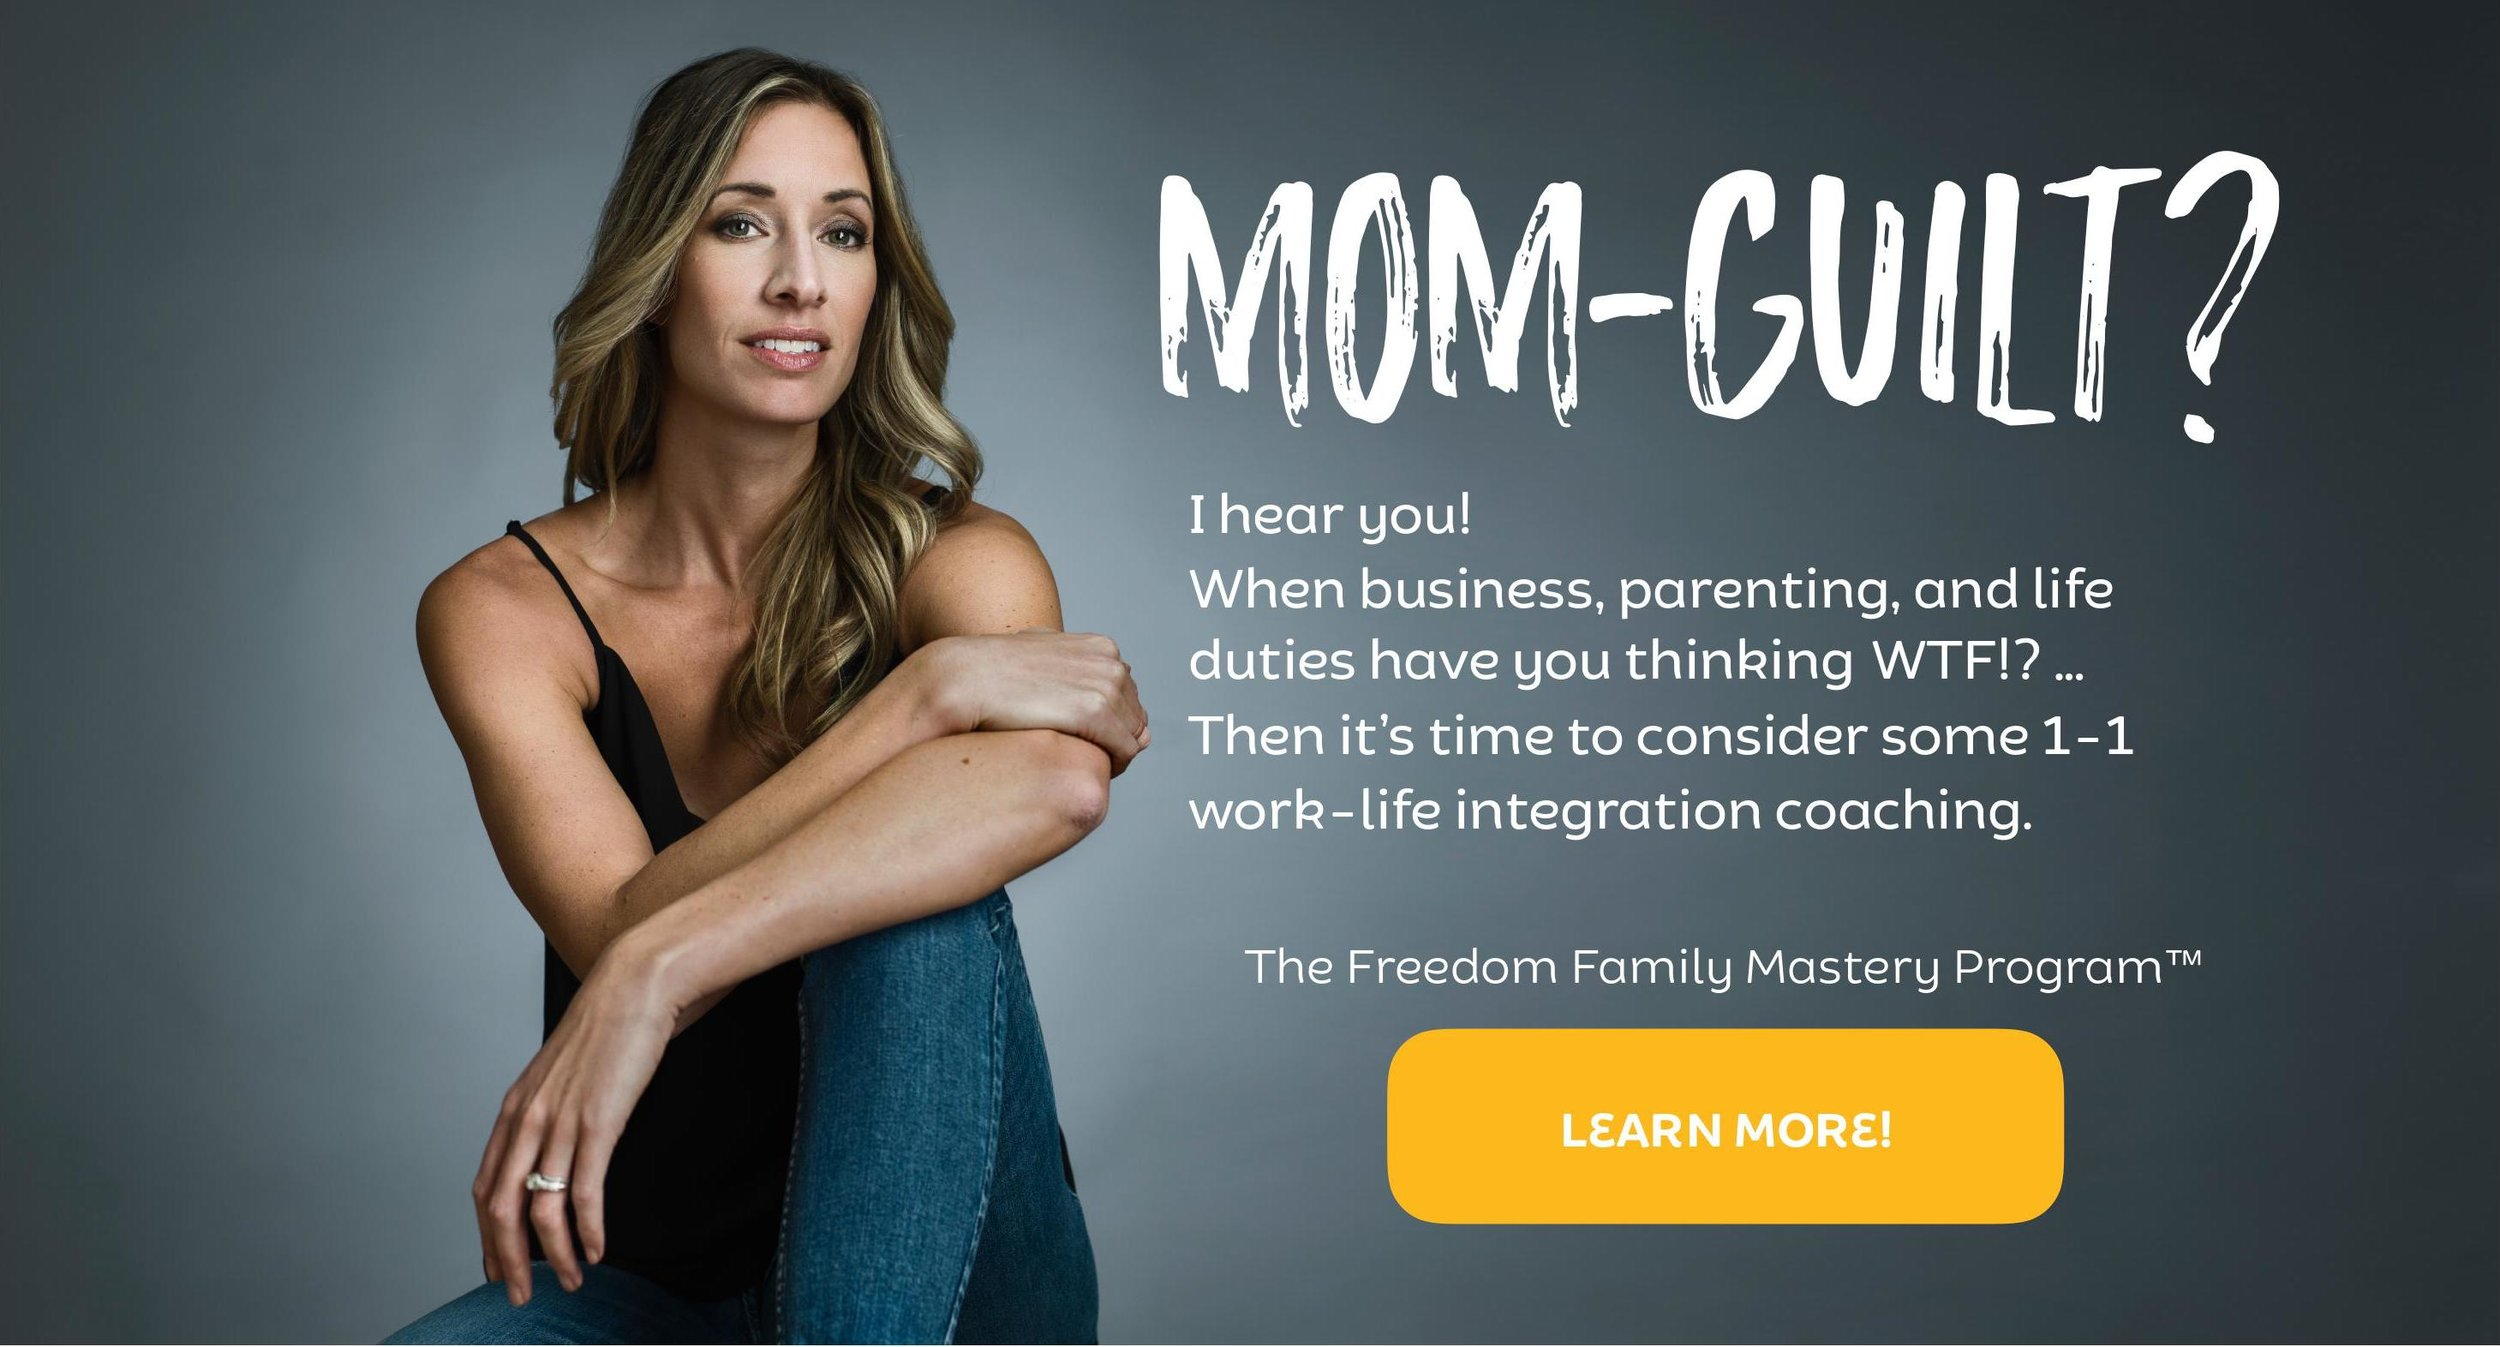 Mom-Guilt ad.jpg